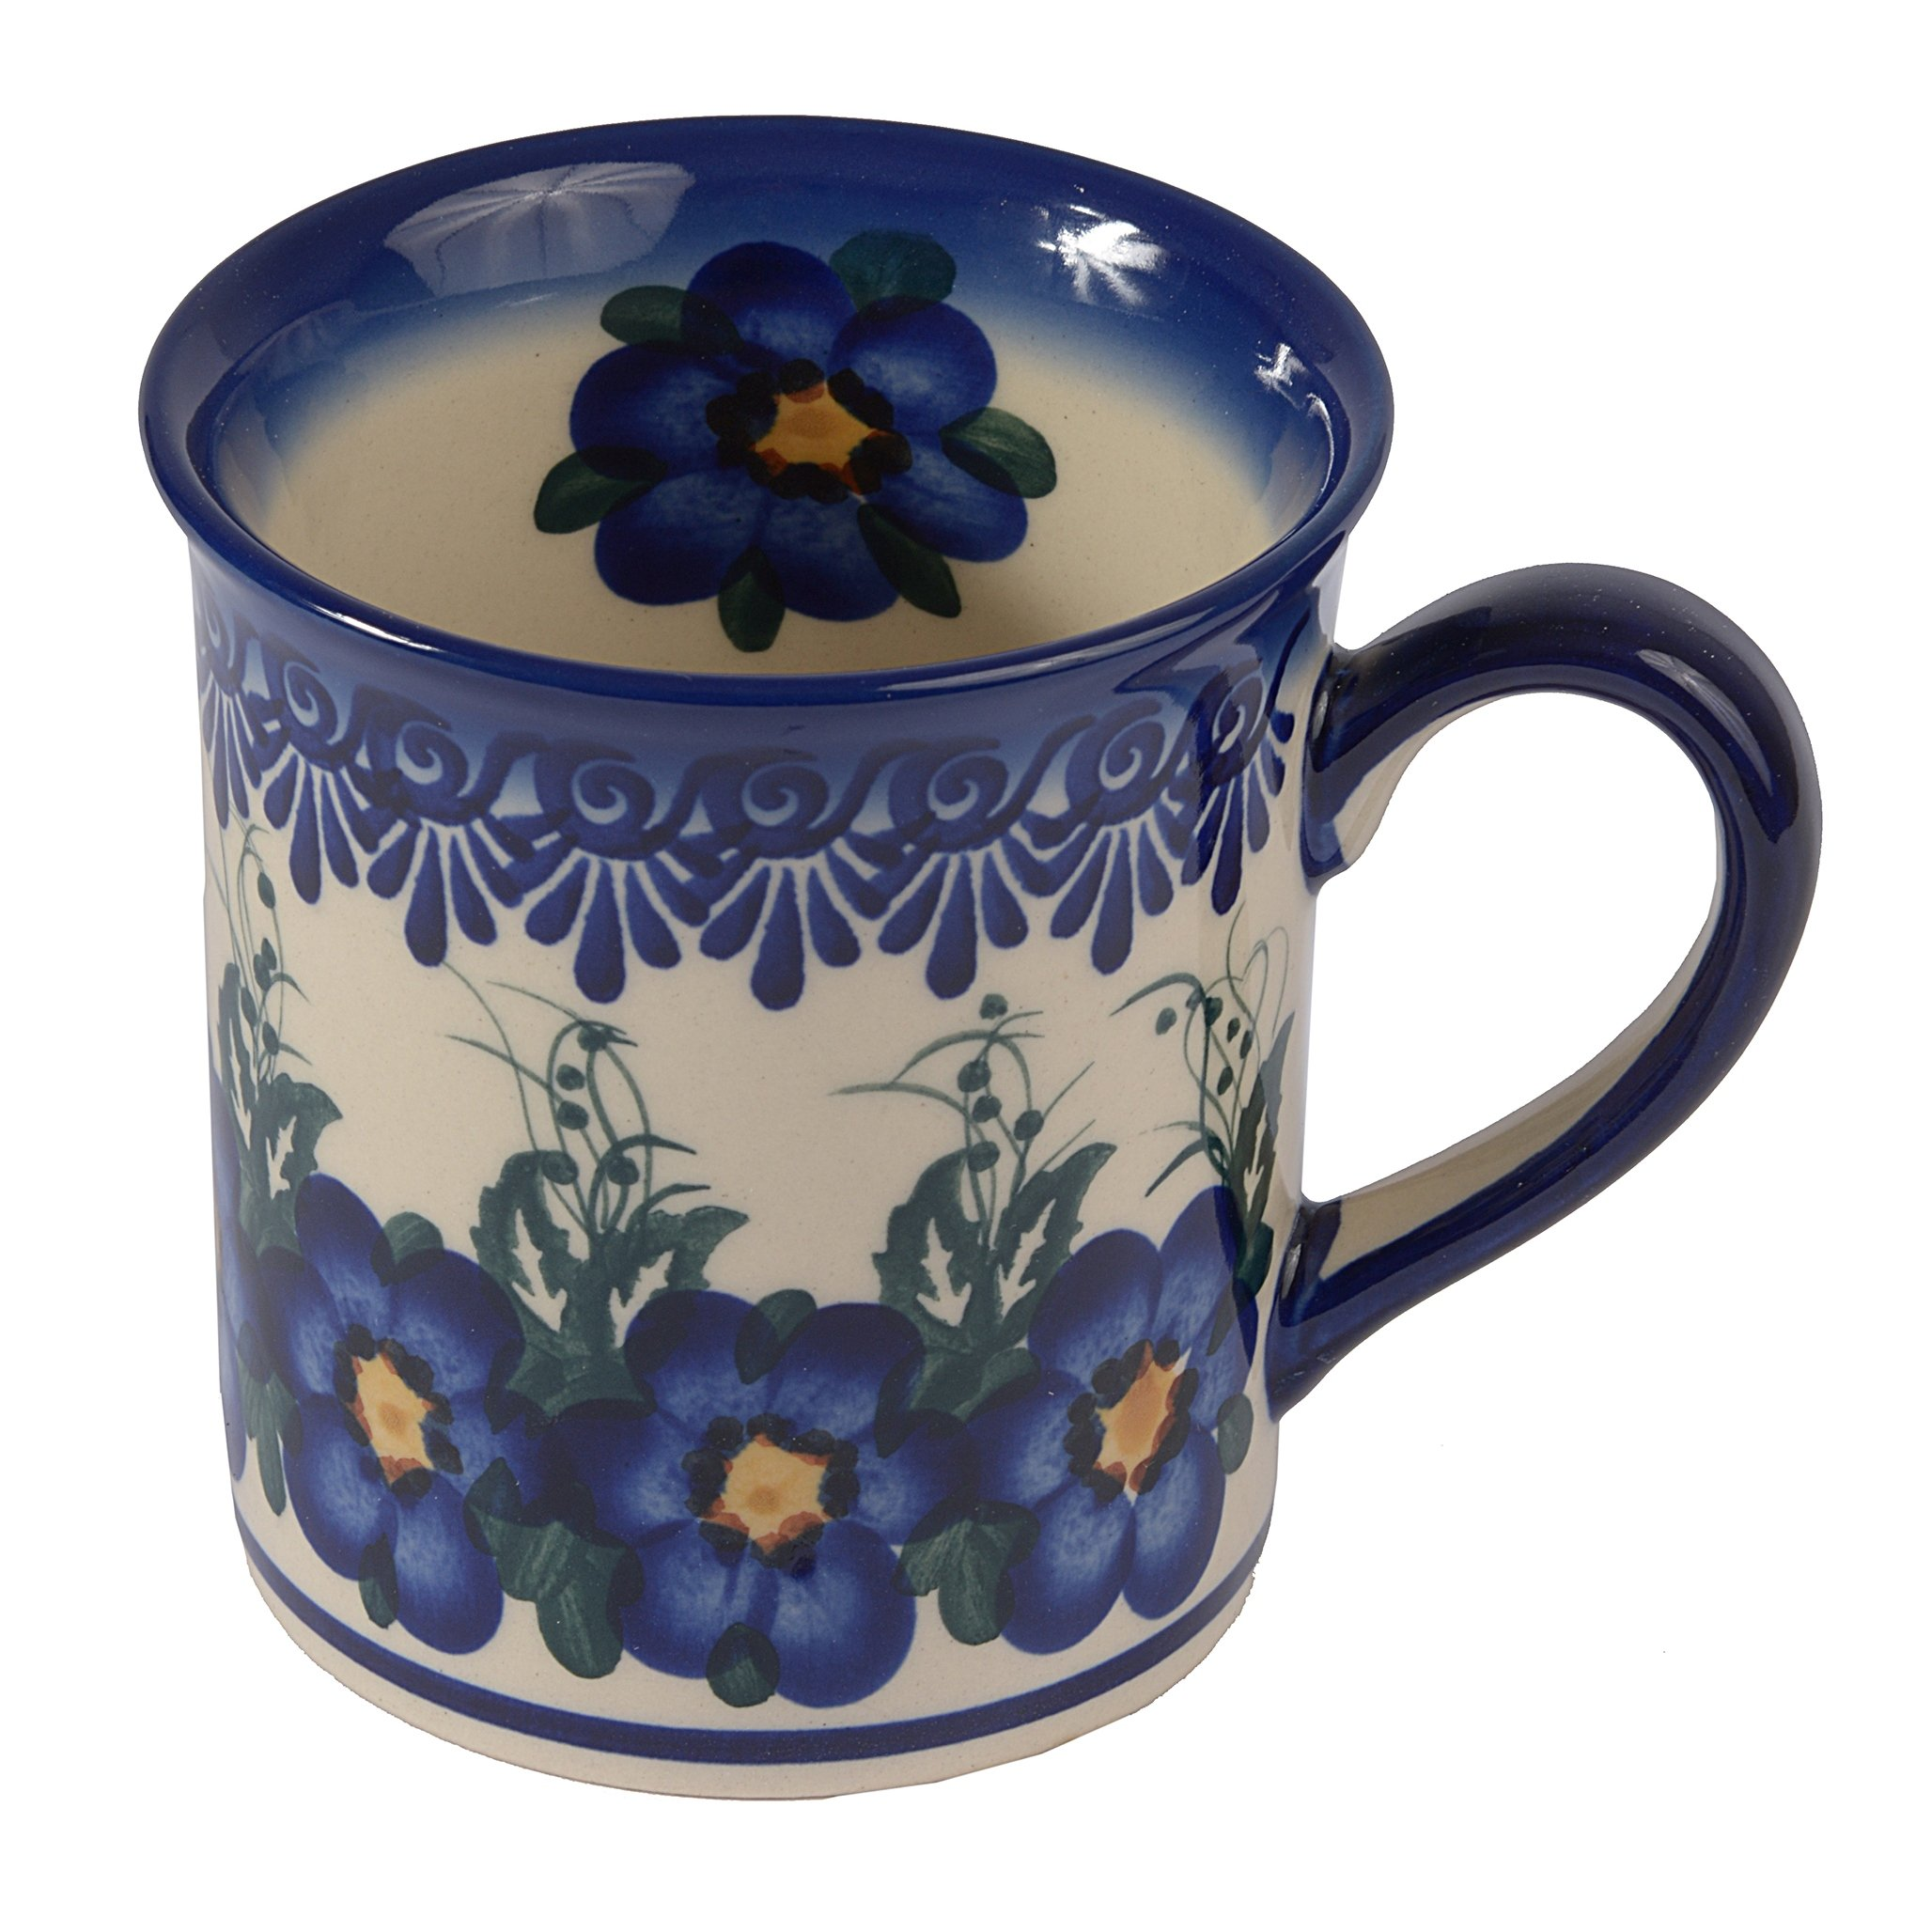 Traditional Polish Pottery, Handcrafted Ceramic Funnel-shaped Mug (300ml / 10.5 fl oz), Boleslawiec Style Pattern, Q.301.PANSY